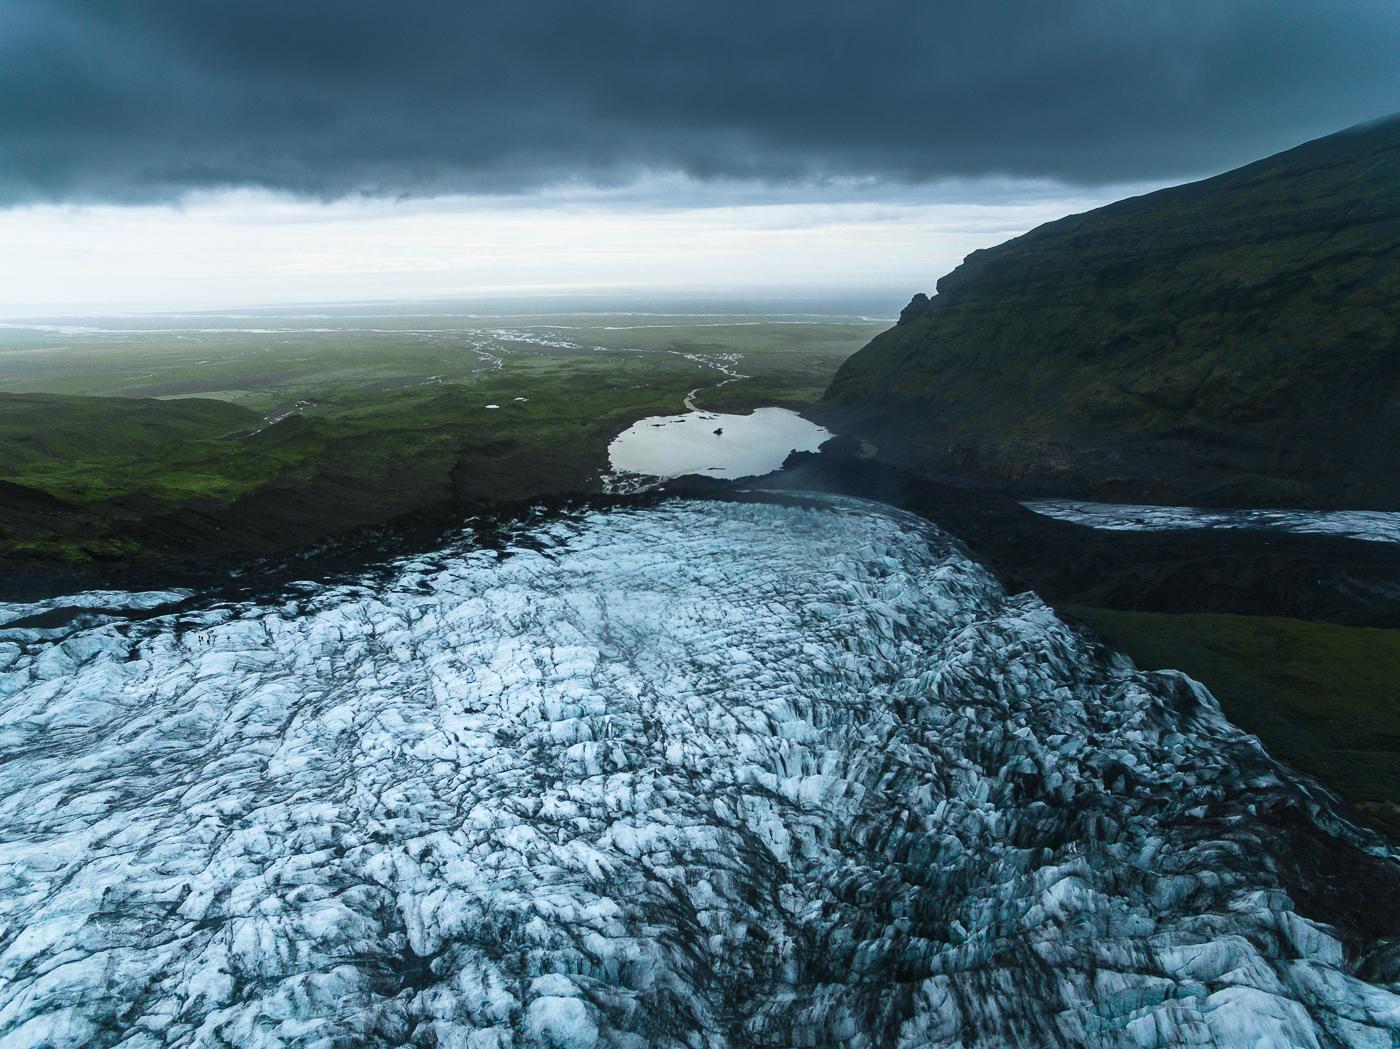 gabornagy_photography_iceland_glacier3.jpg